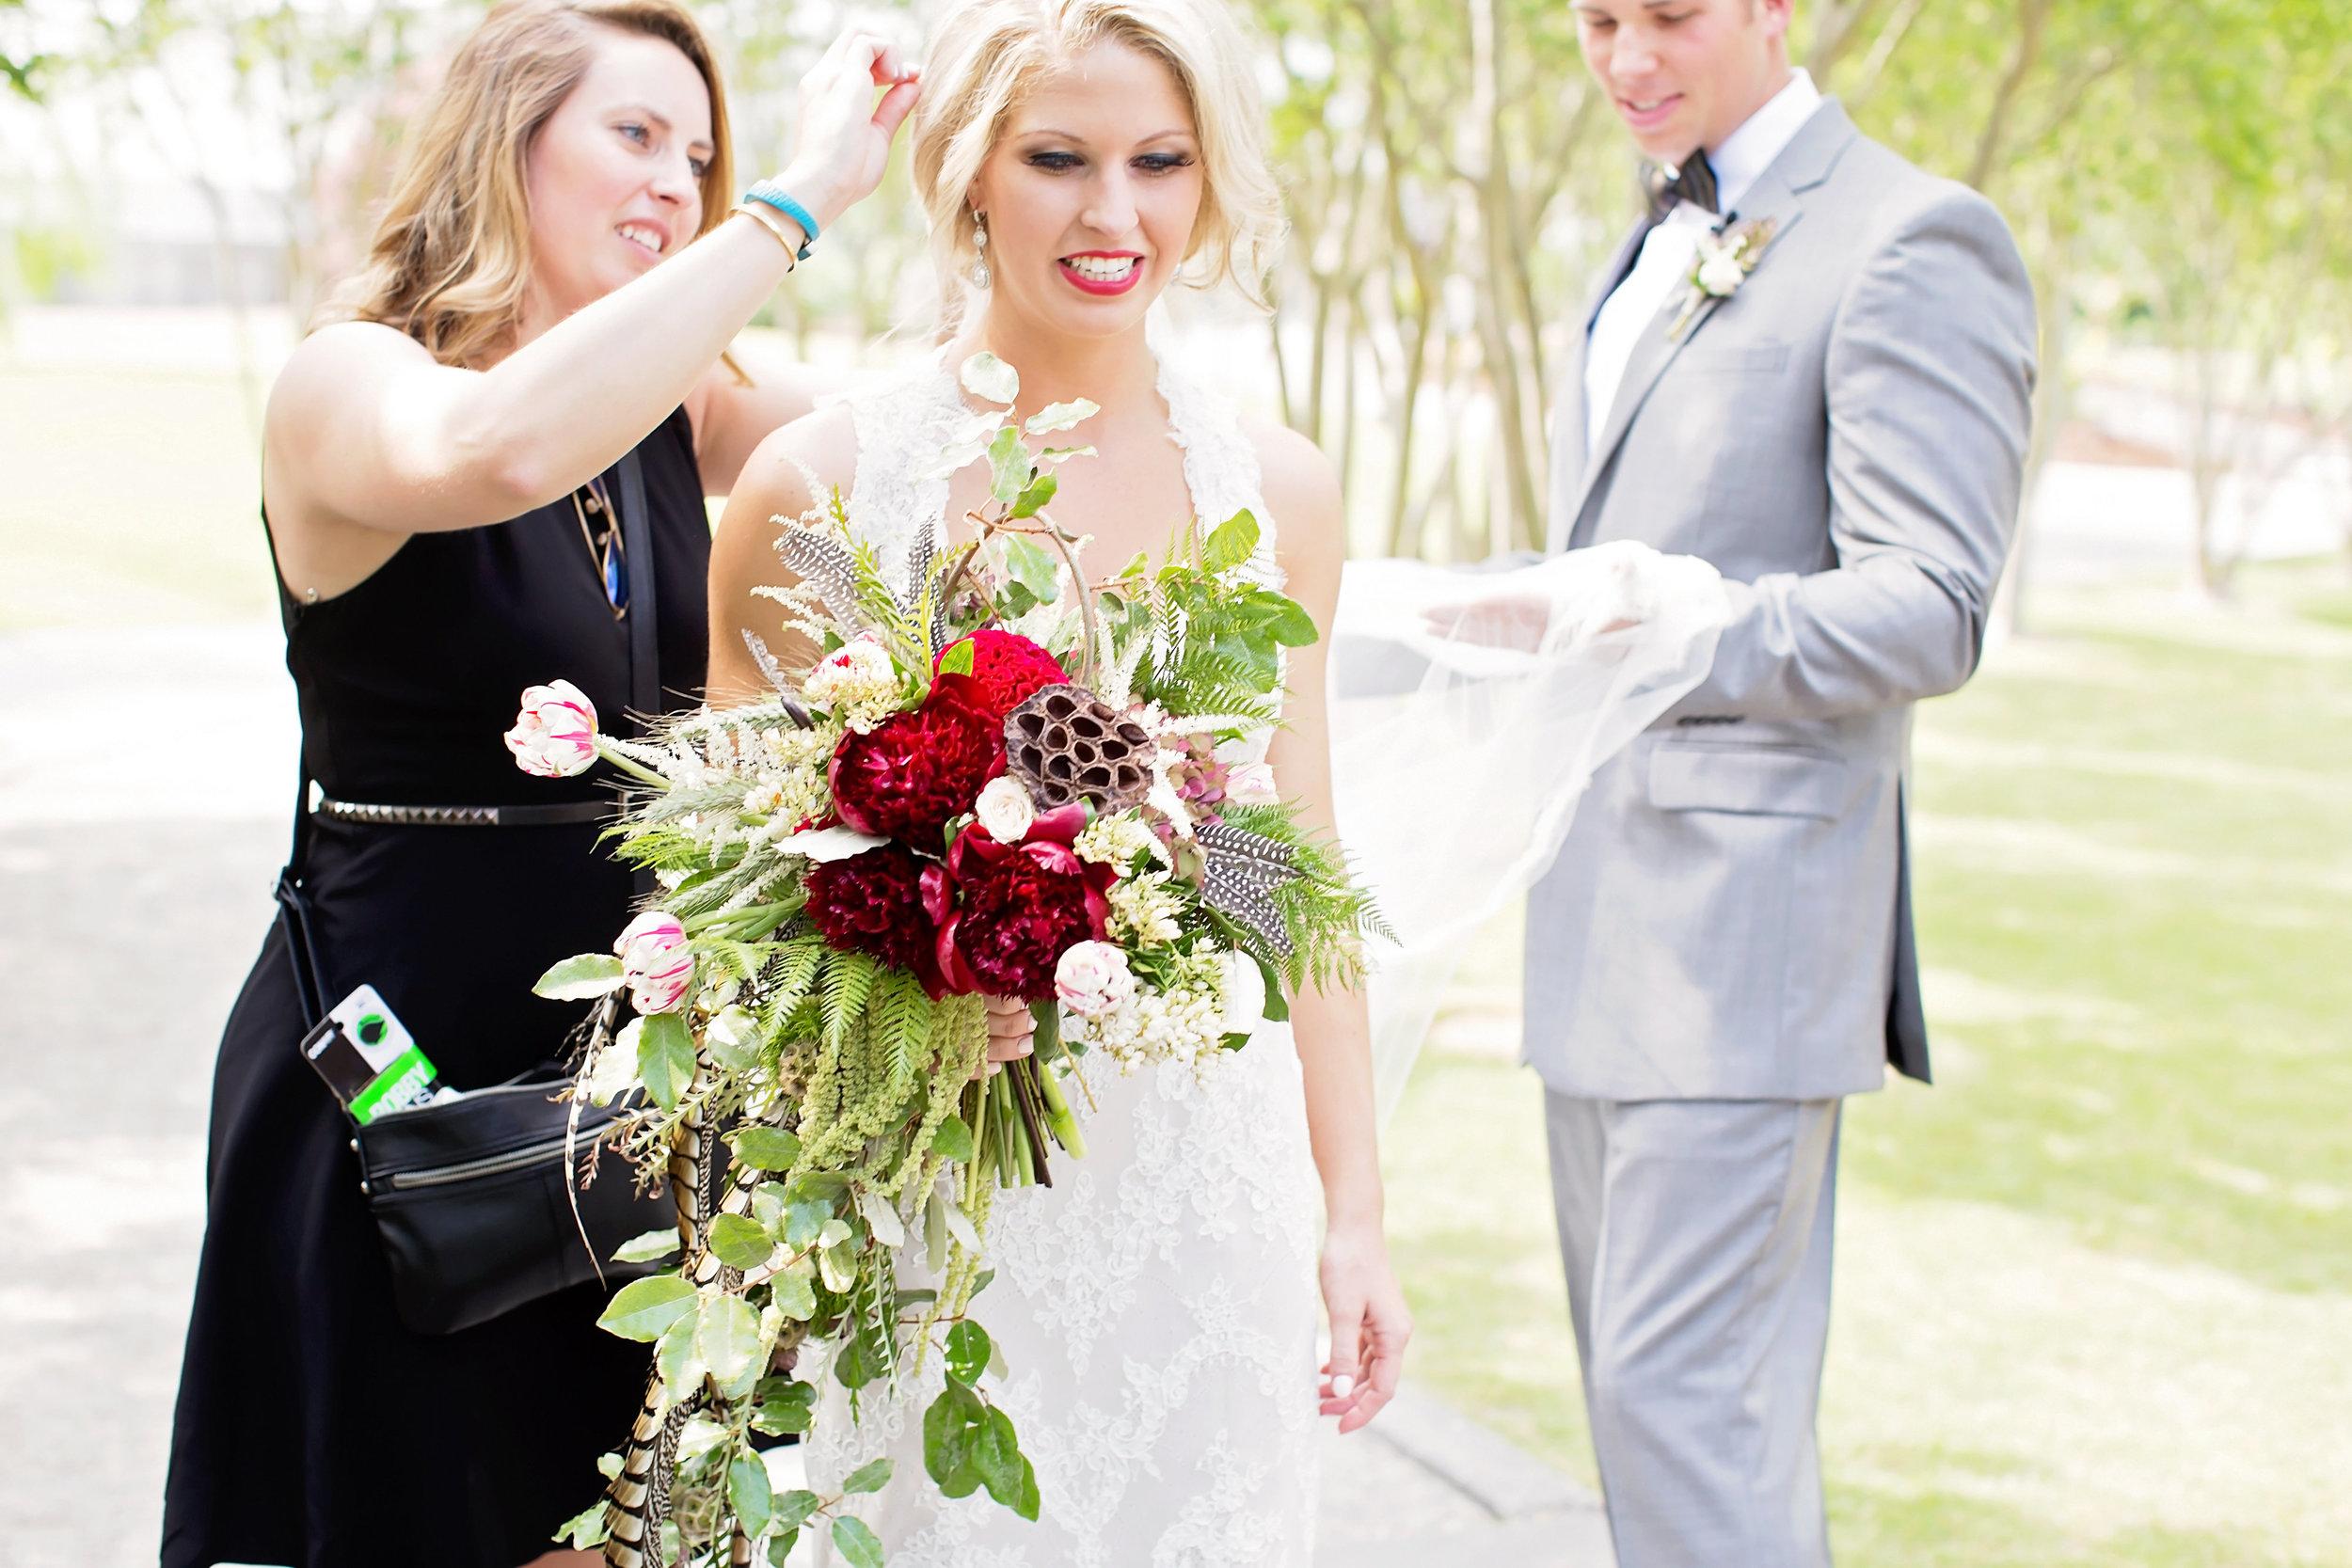 Handley Breaux Designs | Handley McCrory | Magen Davis Photography | Birmingham Wedding